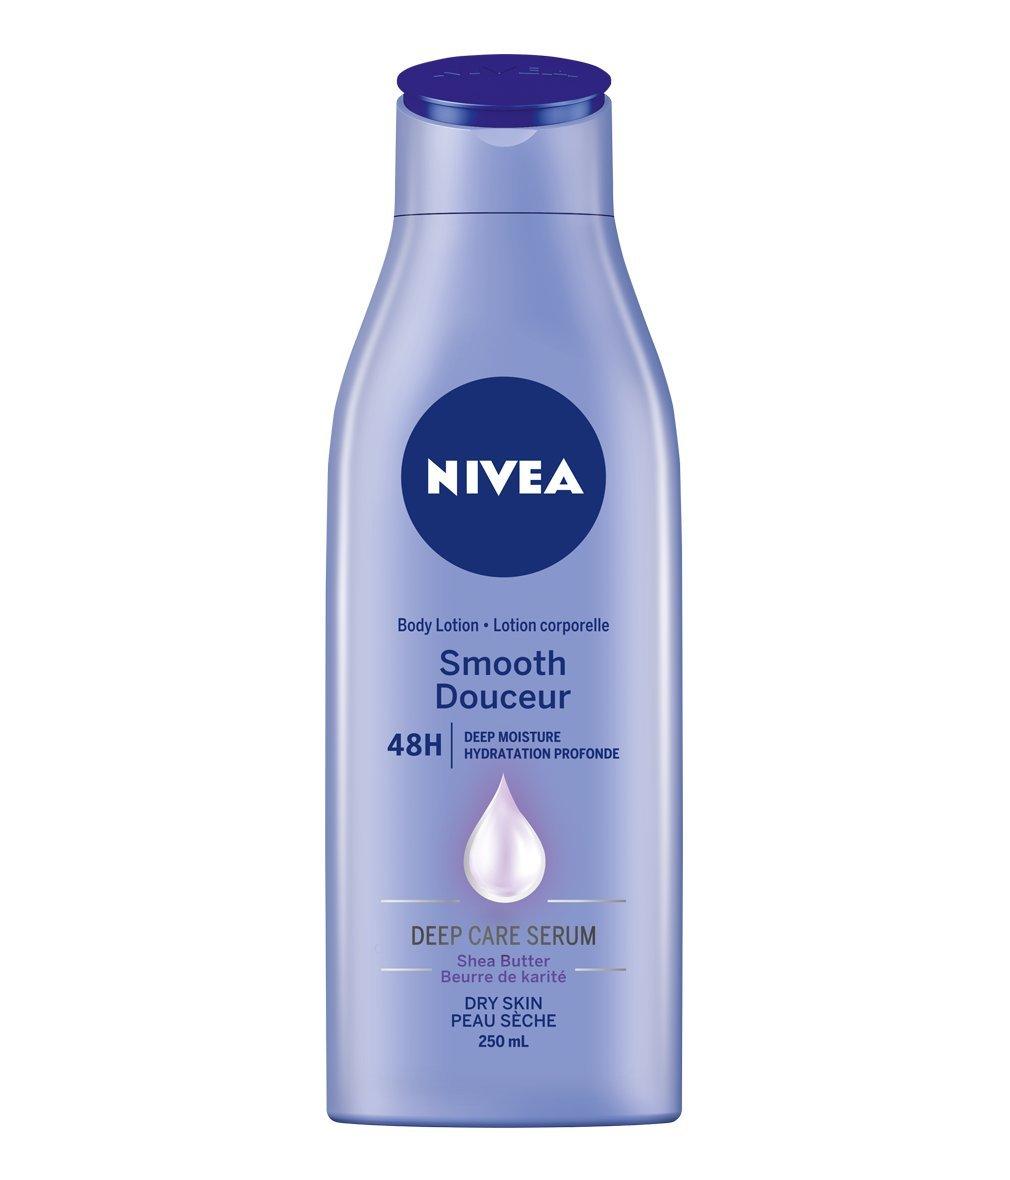 NIVEA Nourishing 48H Deep Moisture Body Milk for Dry to Very Dry Skin, 625 mL 056594005334